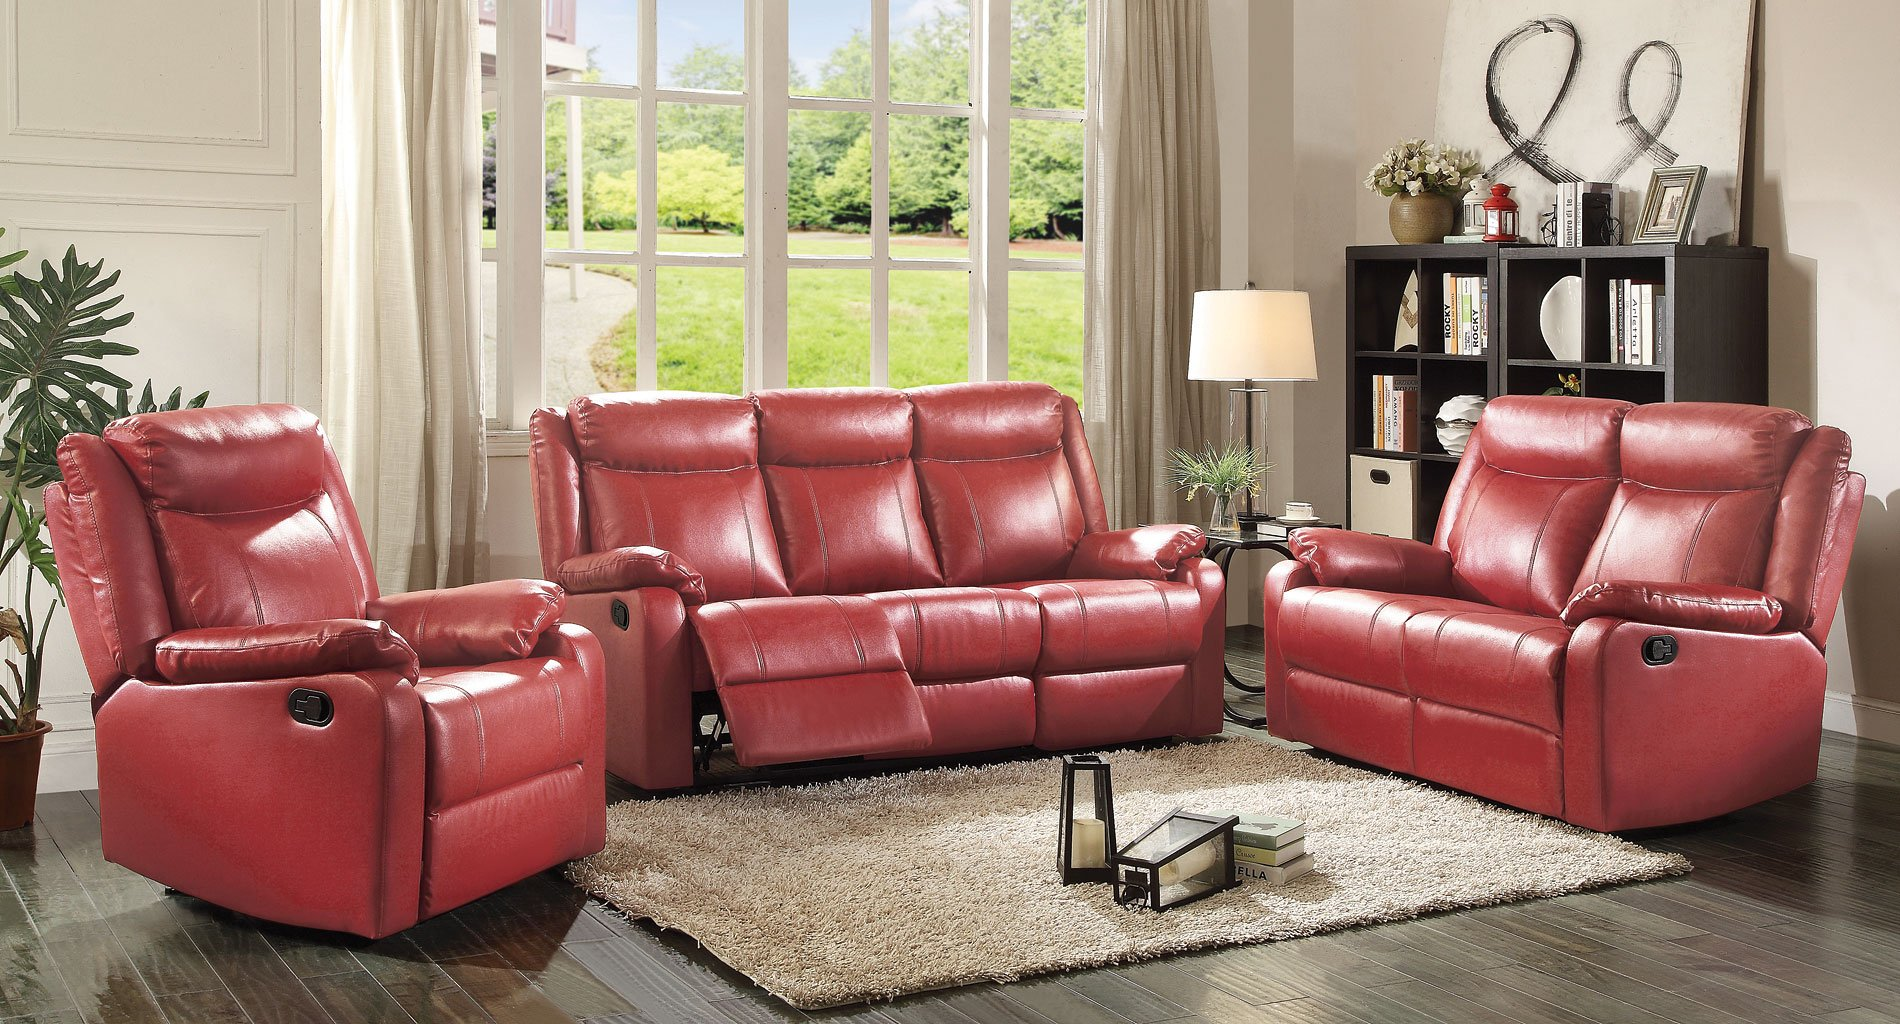 g765 reclining living room set red living room sets